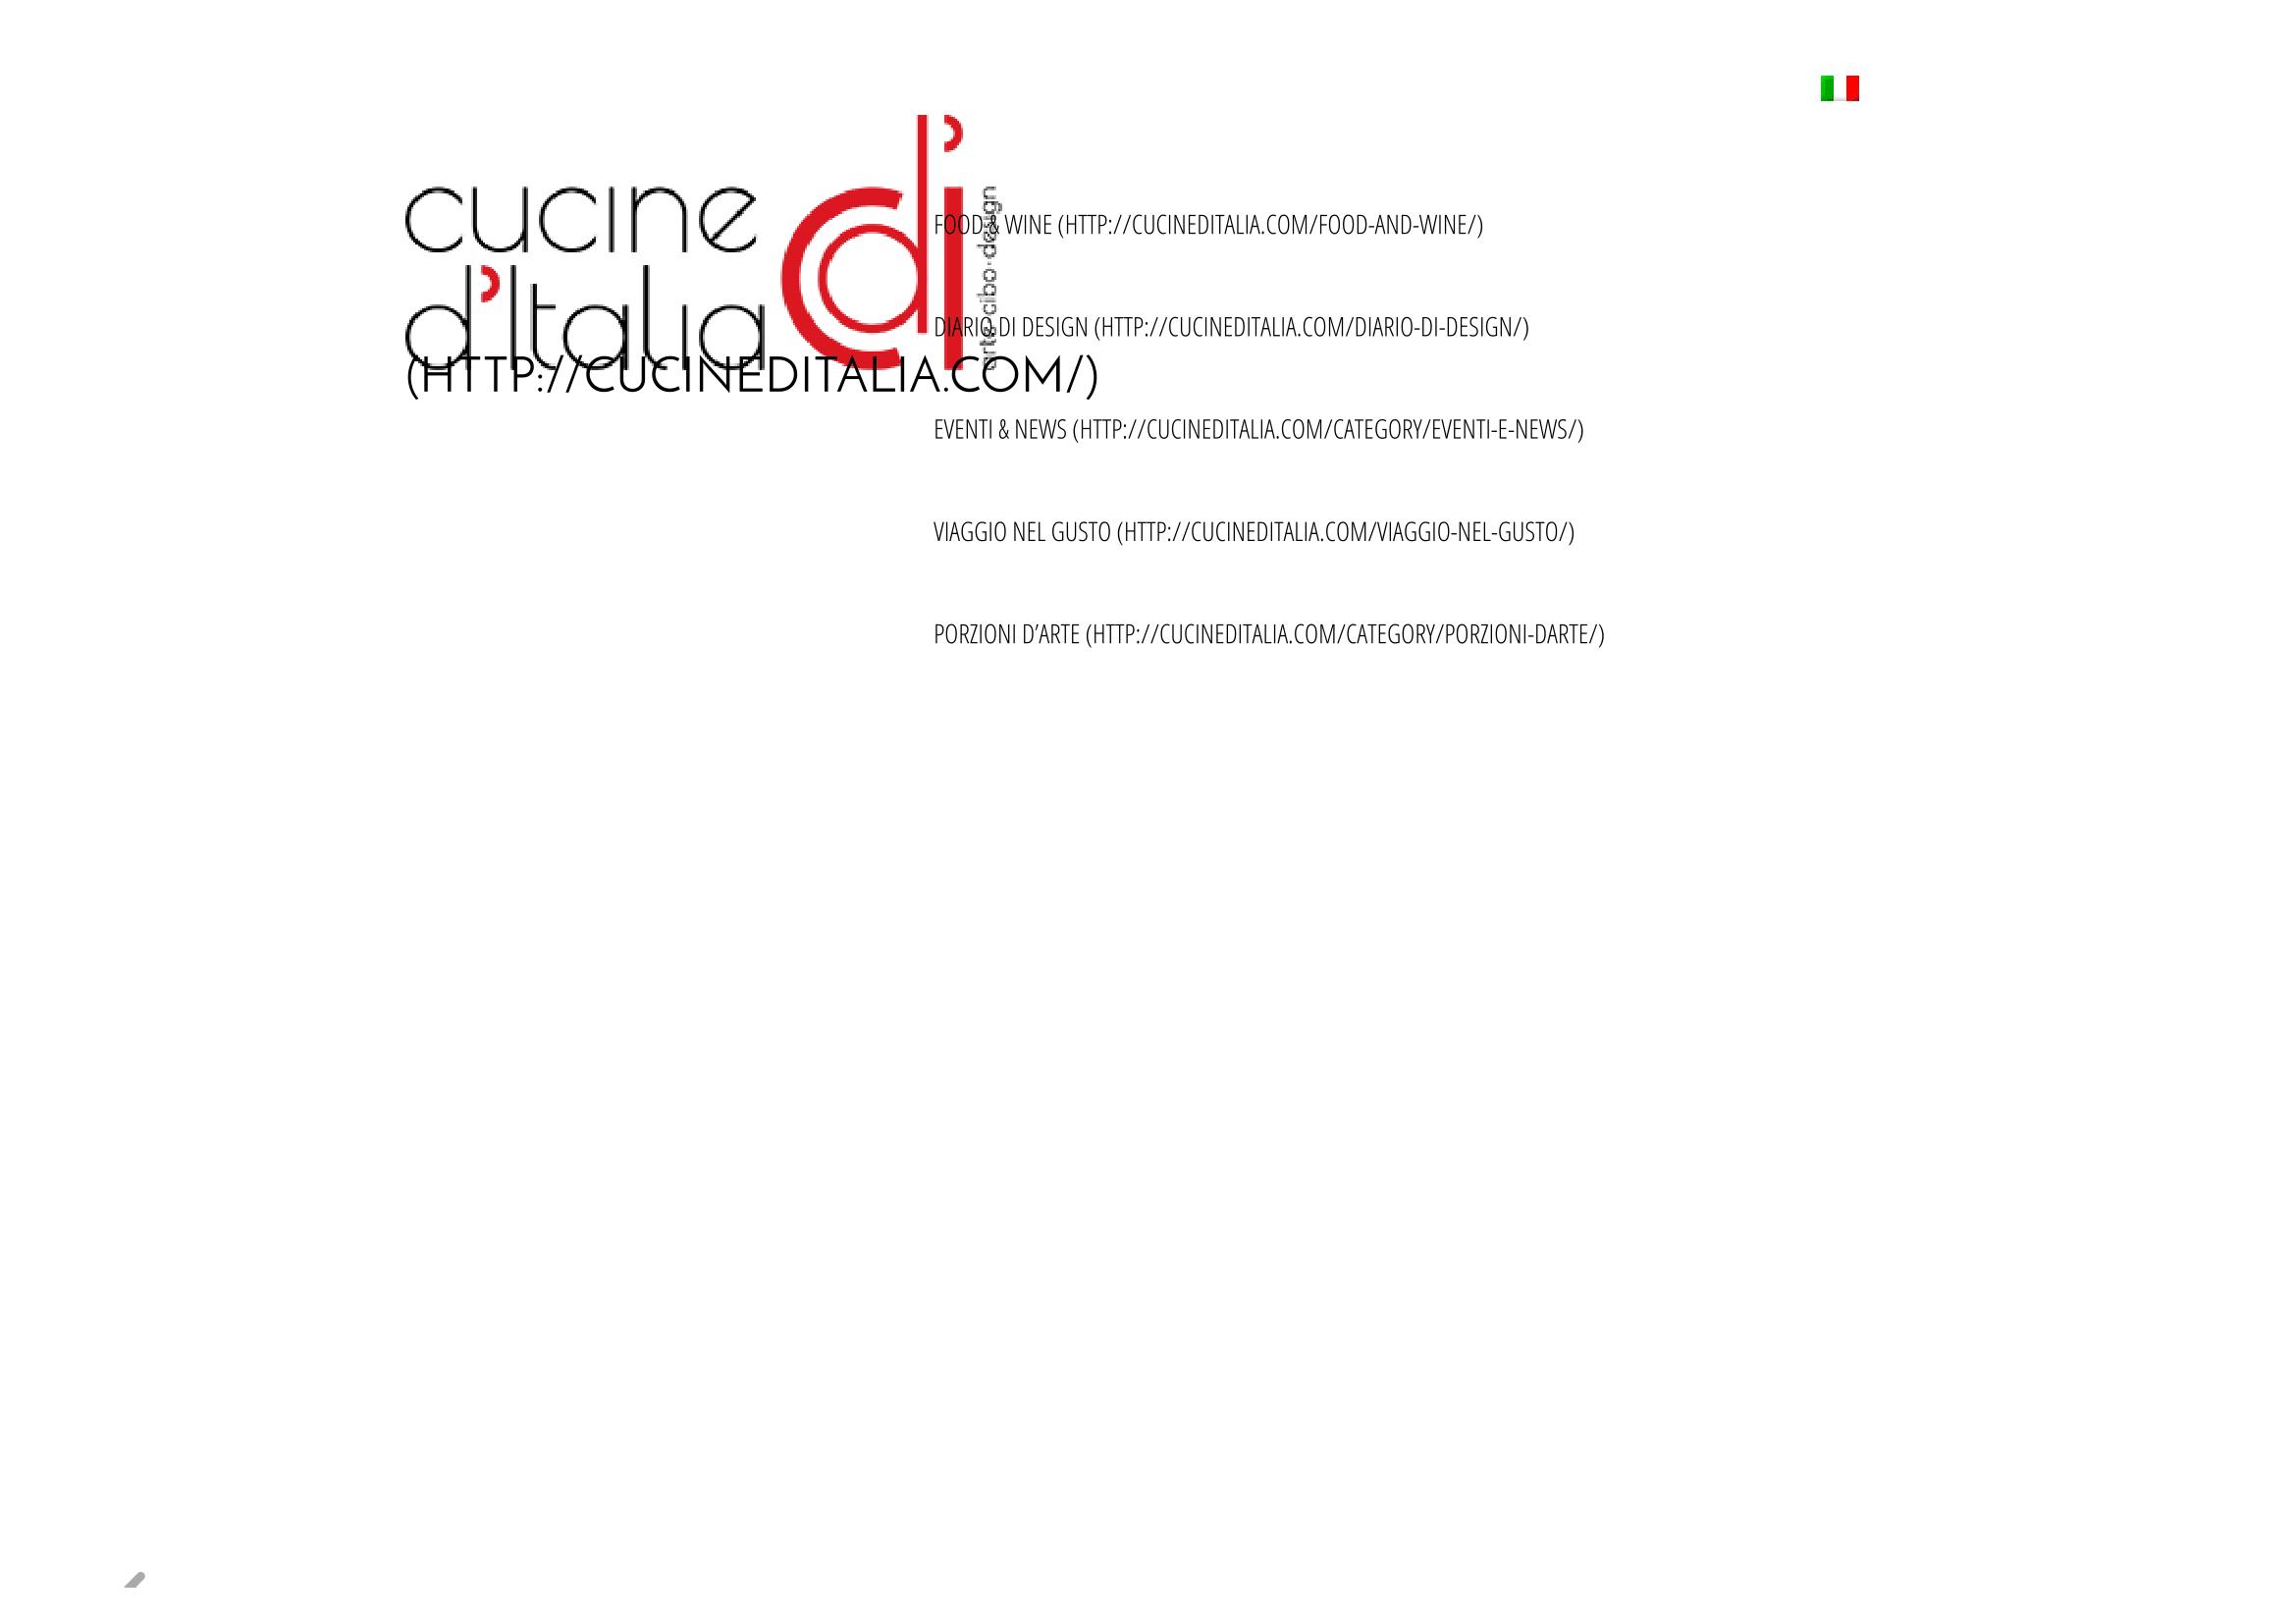 06.07.2016_cucineditalia.com-1